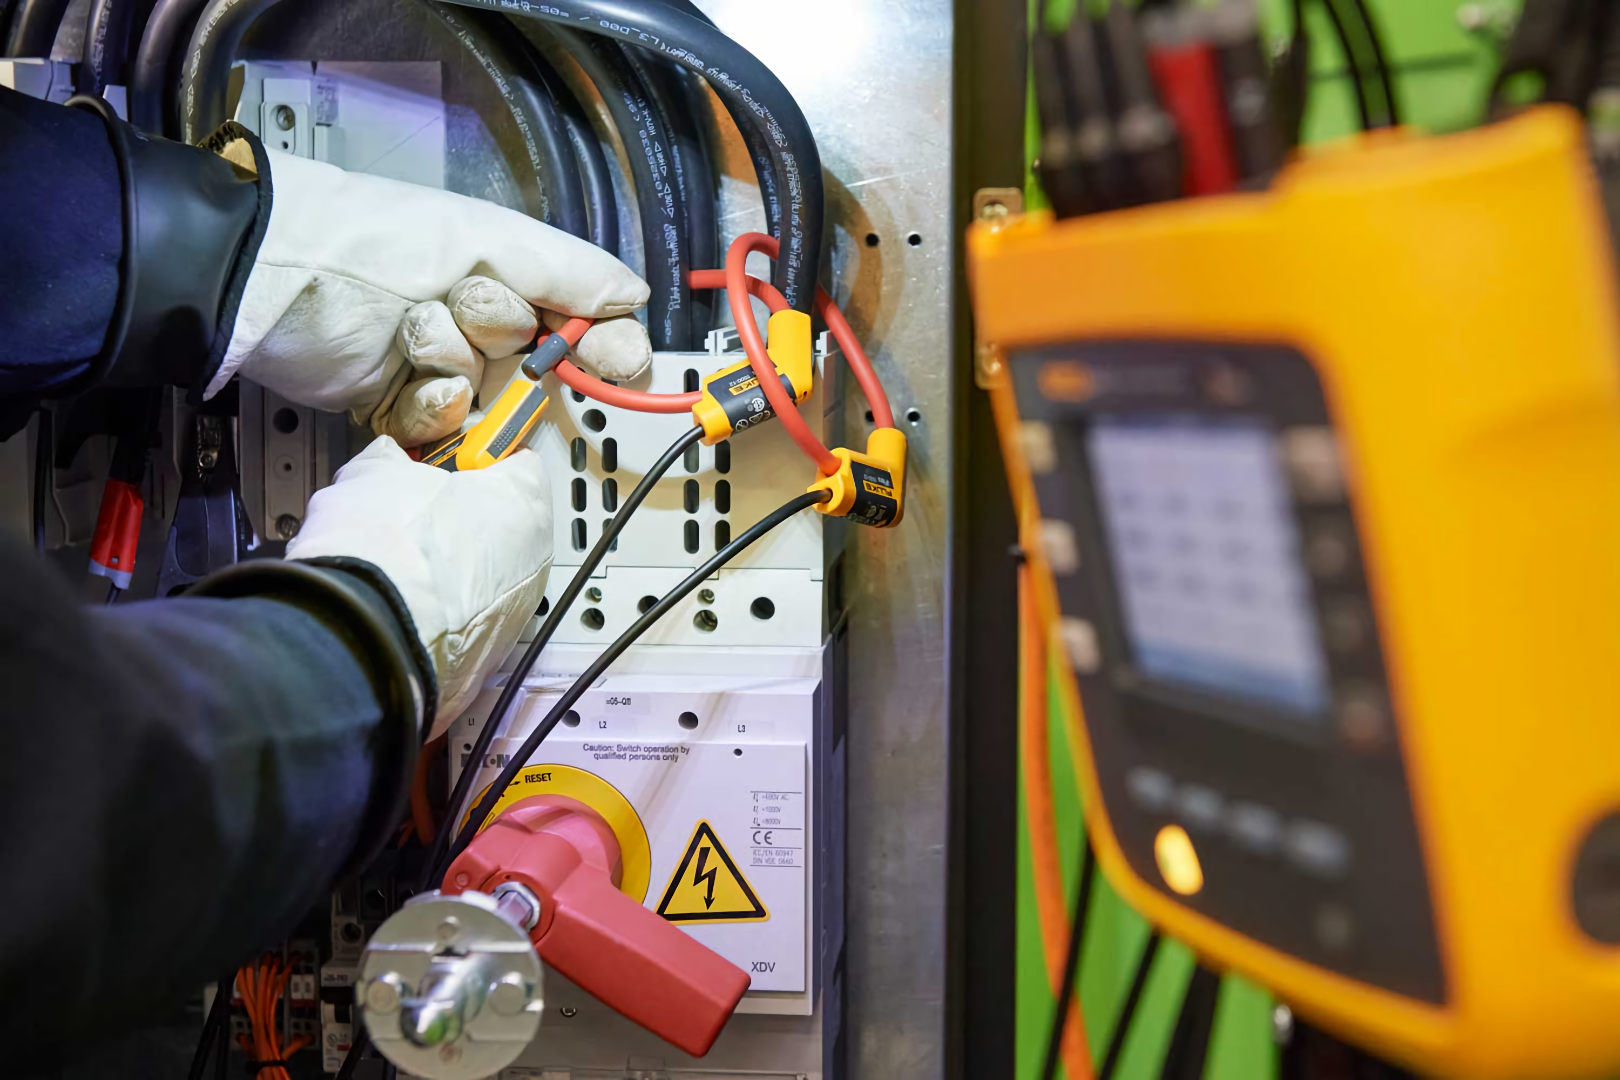 electrician using power analyzer on electrical switchboard